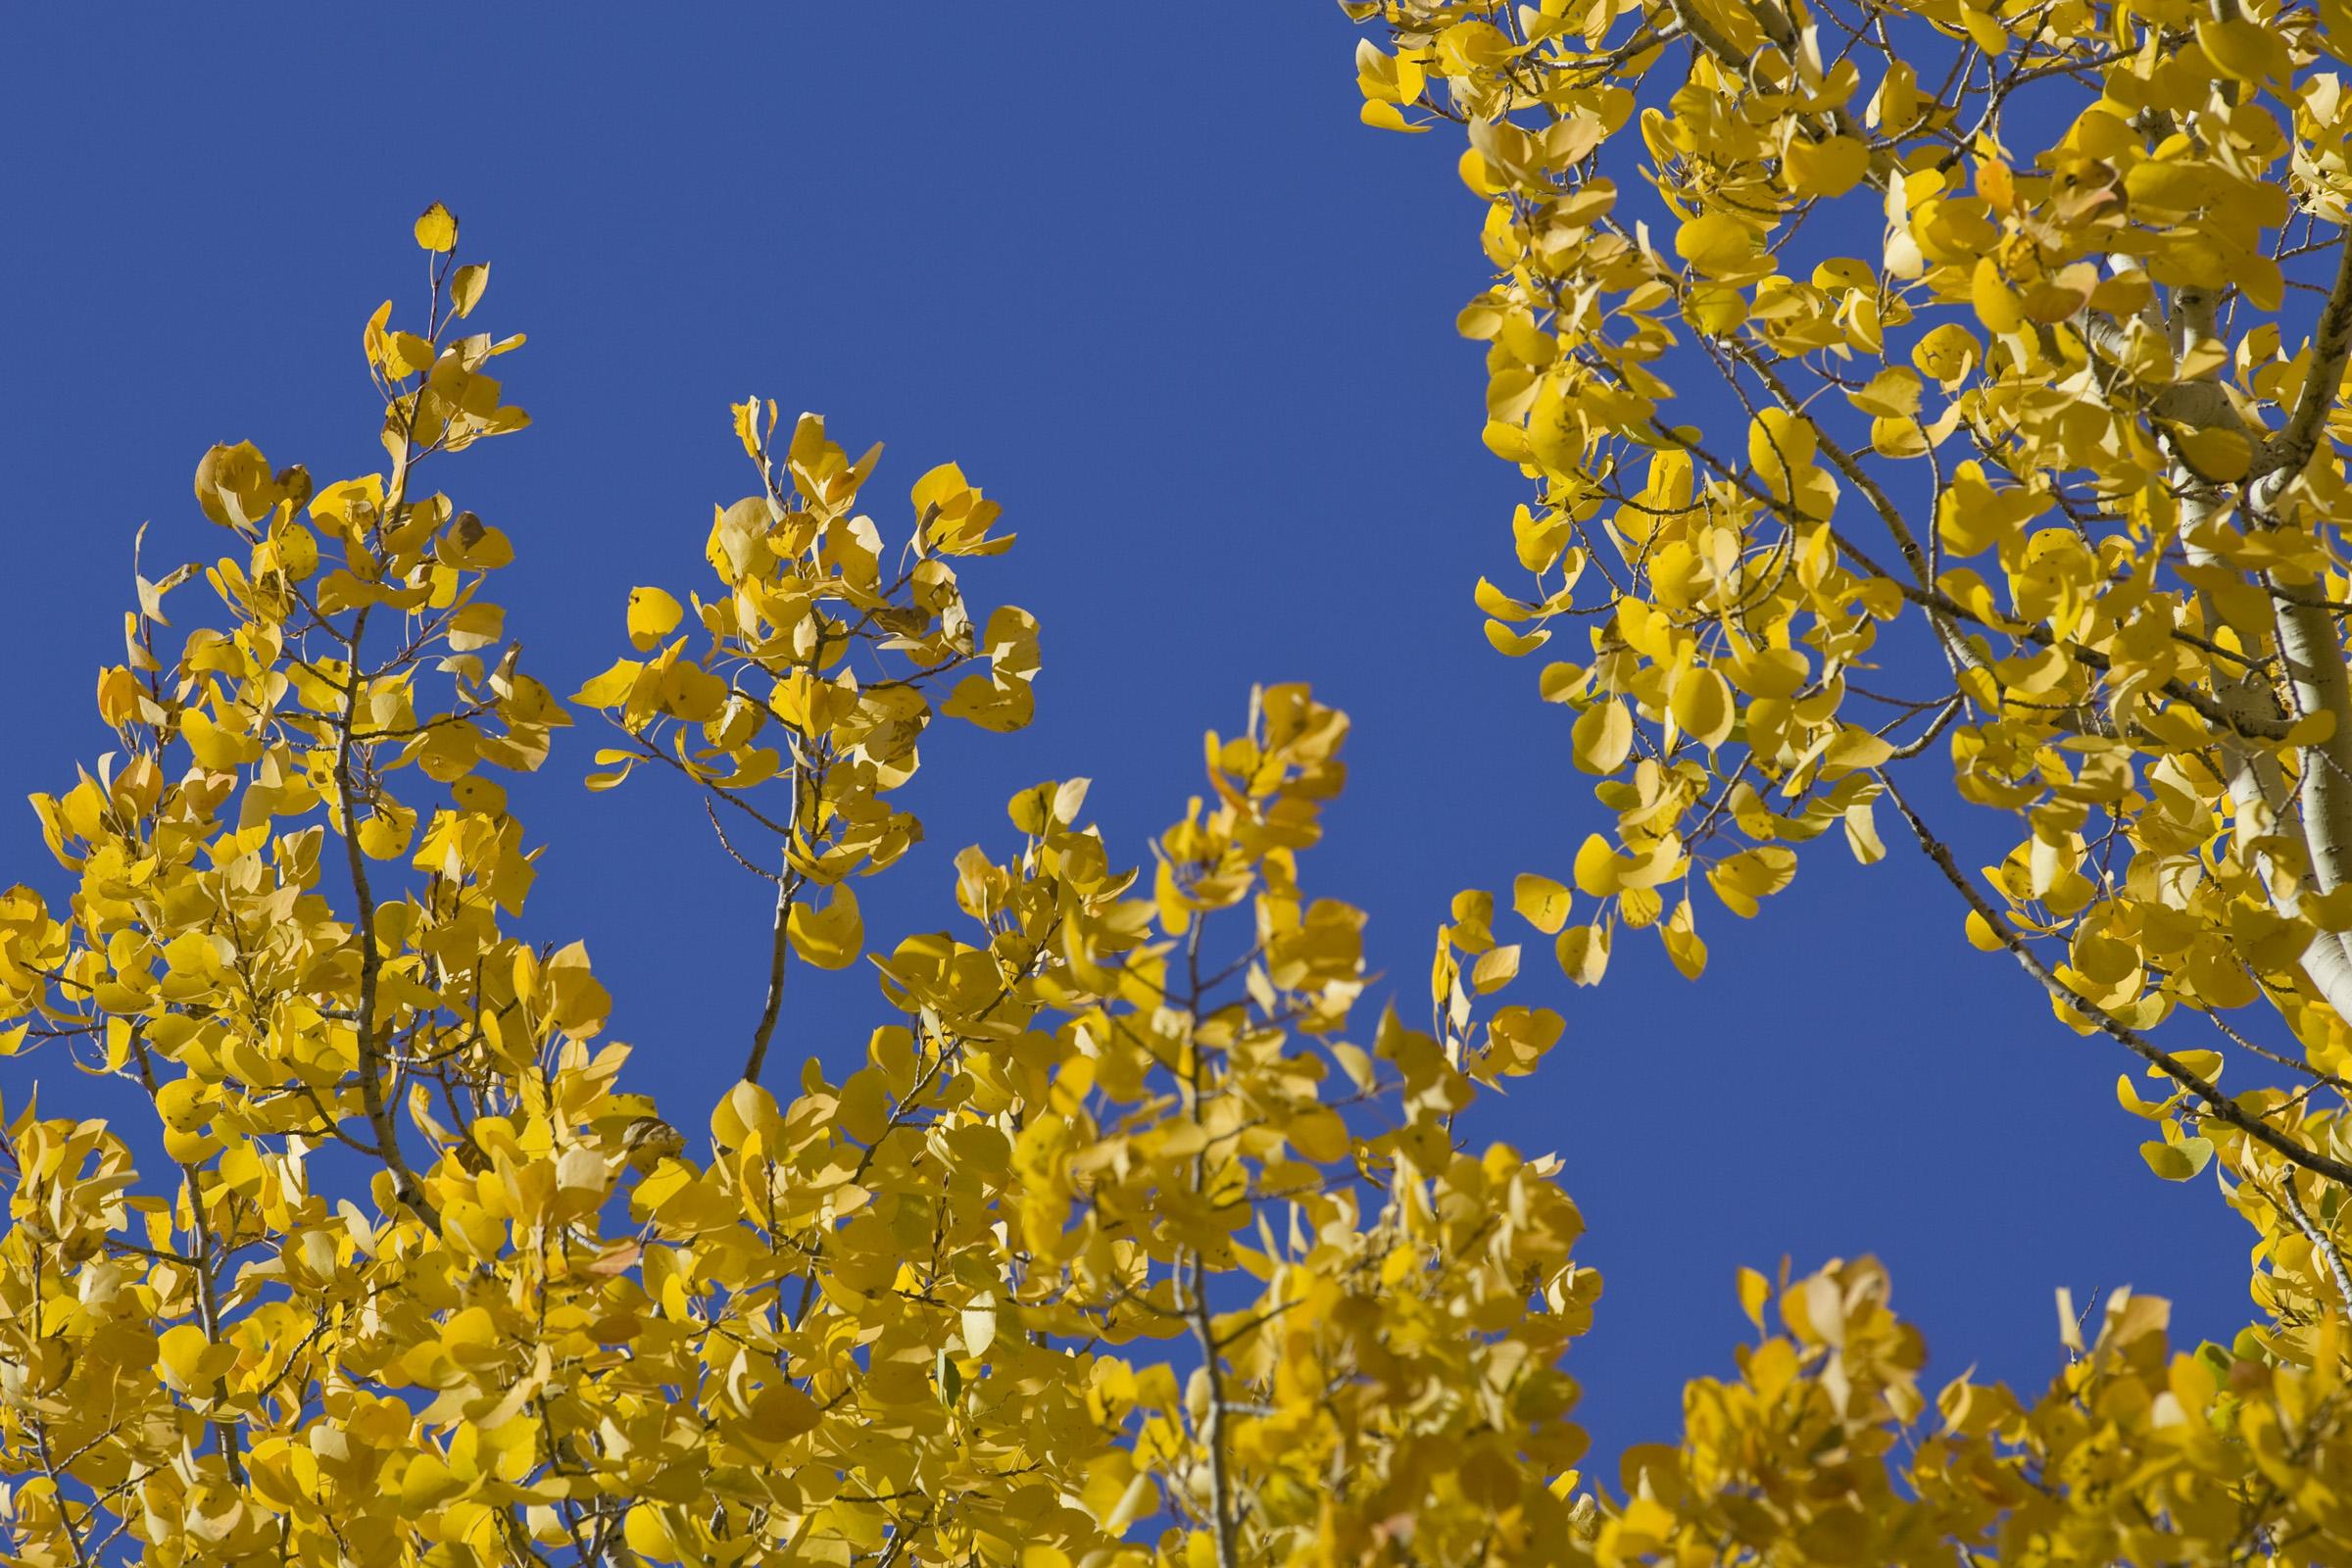 Photo: Aspen trees